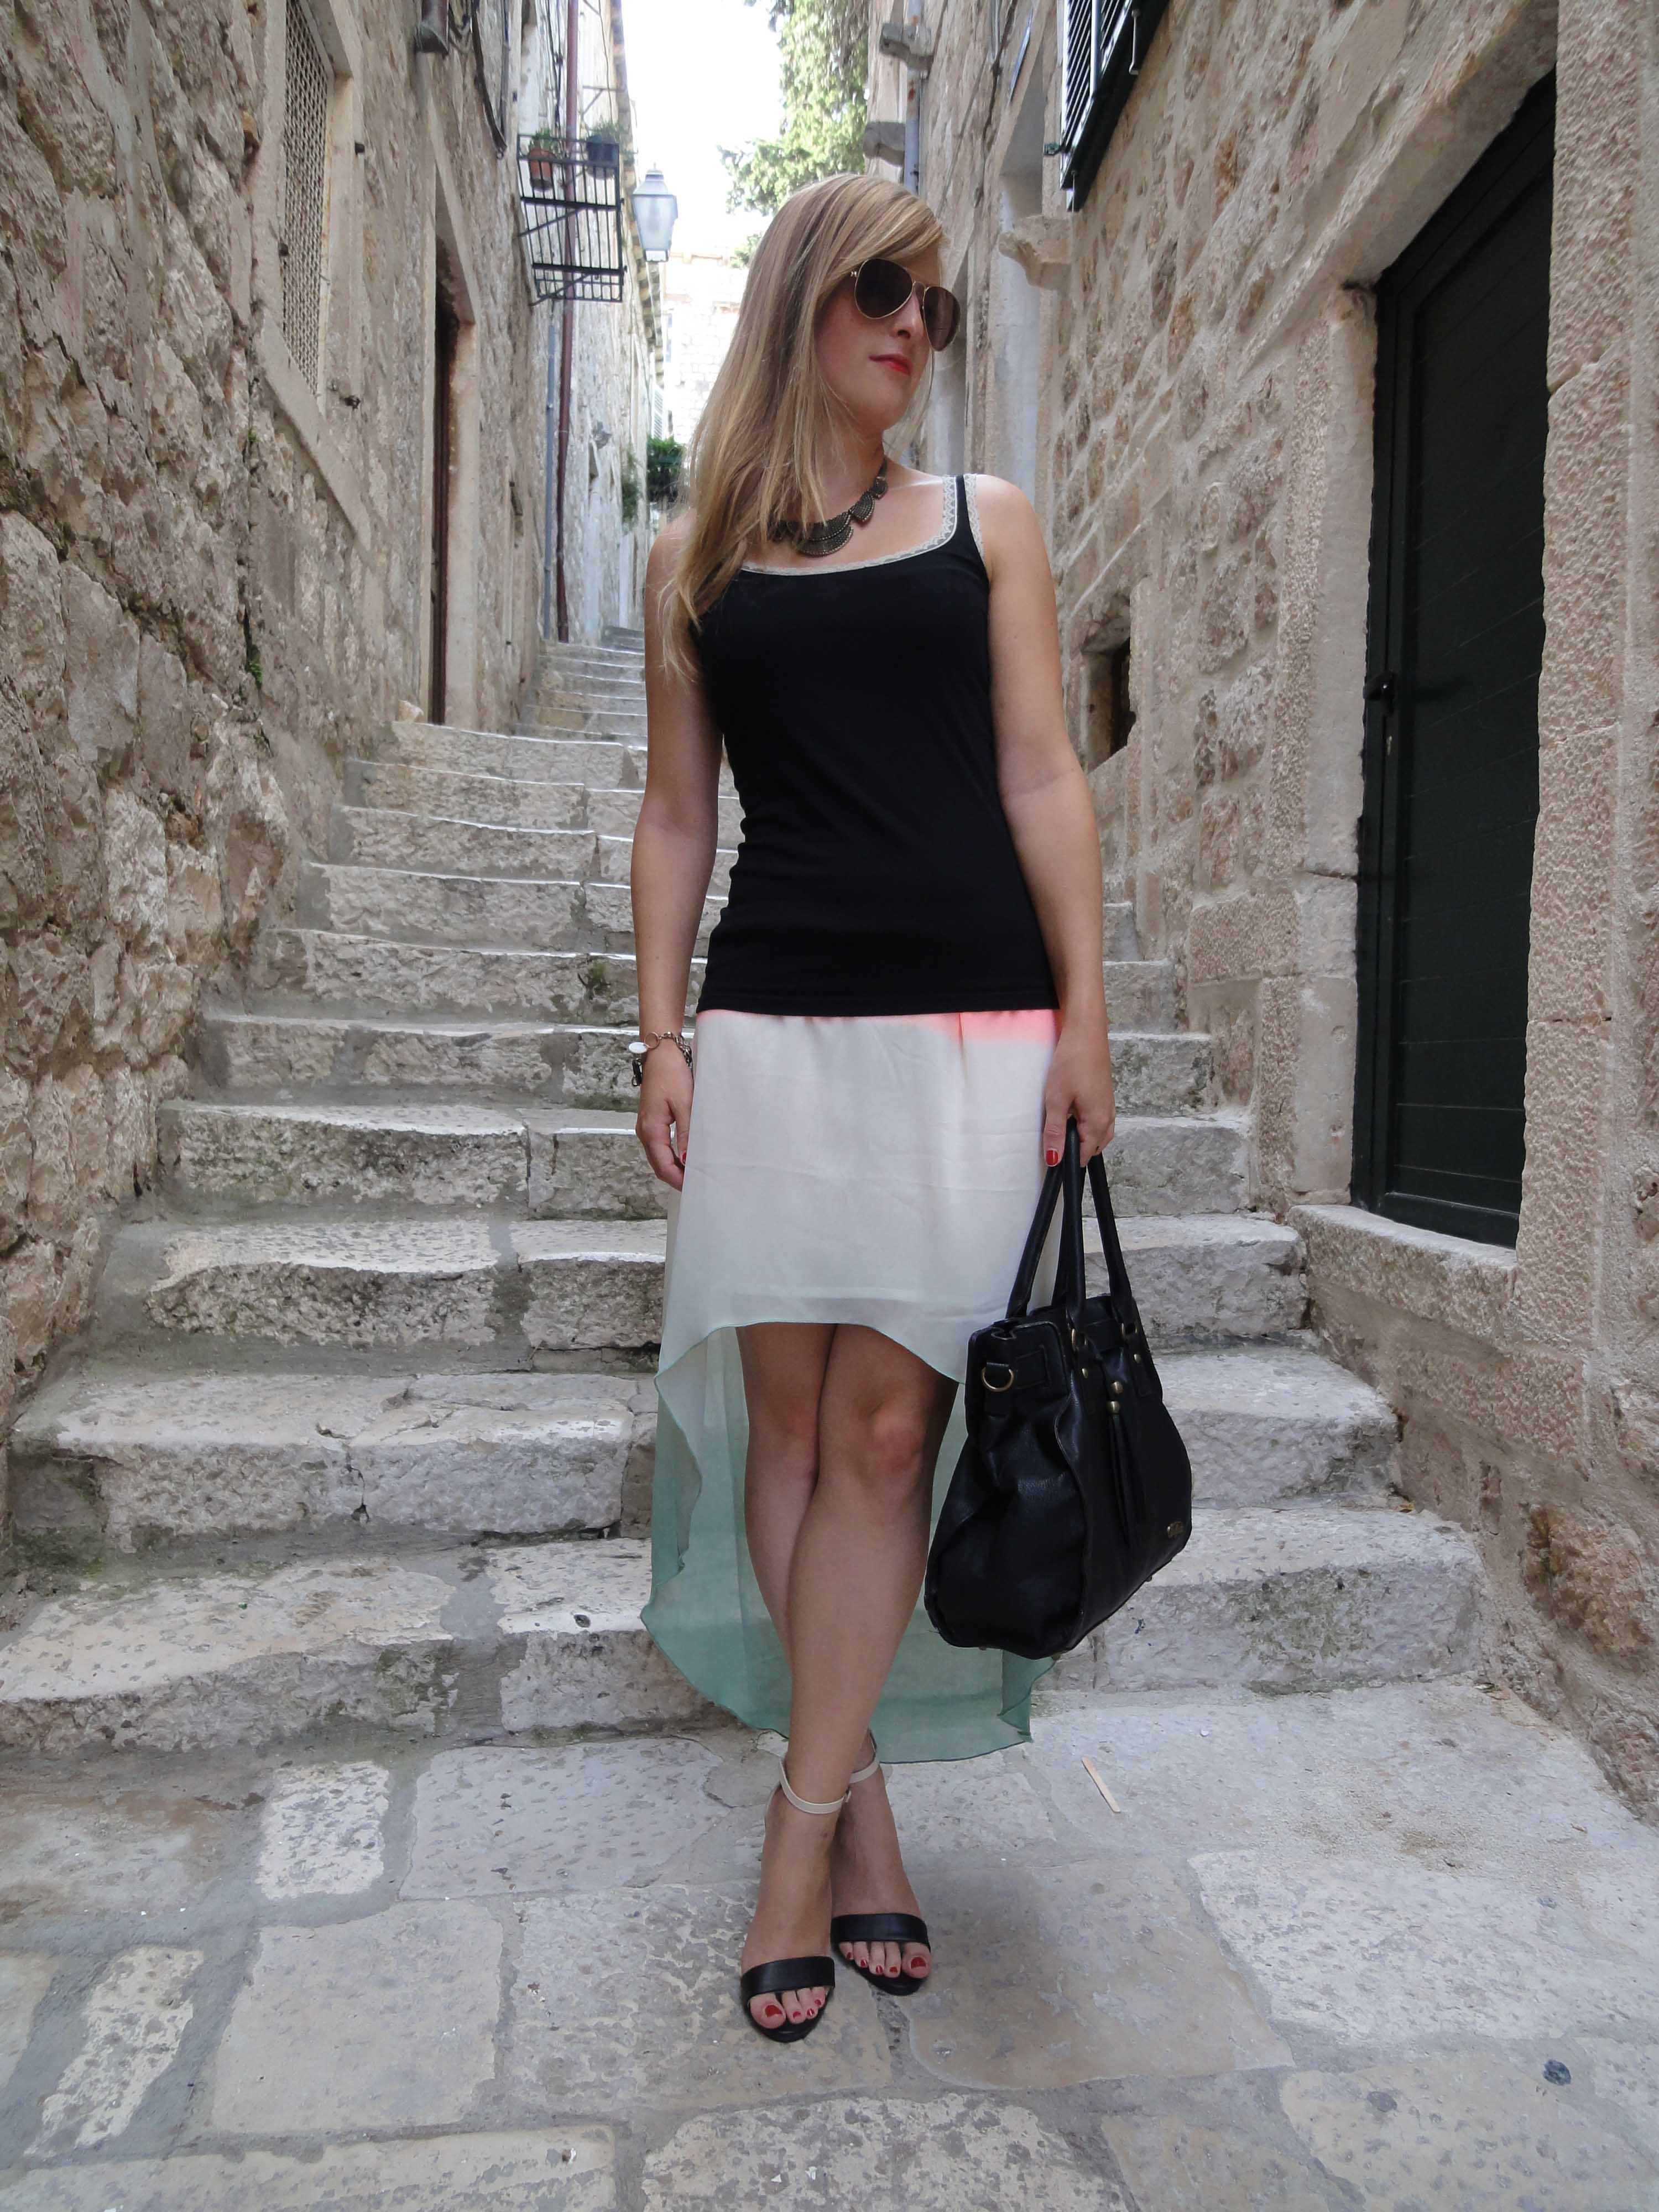 Mullet Skirt Vokuhila Rock kombinieren Sommeroutfit Fashion Look Dubrovnik Pilotensonnenbrille Modeblog